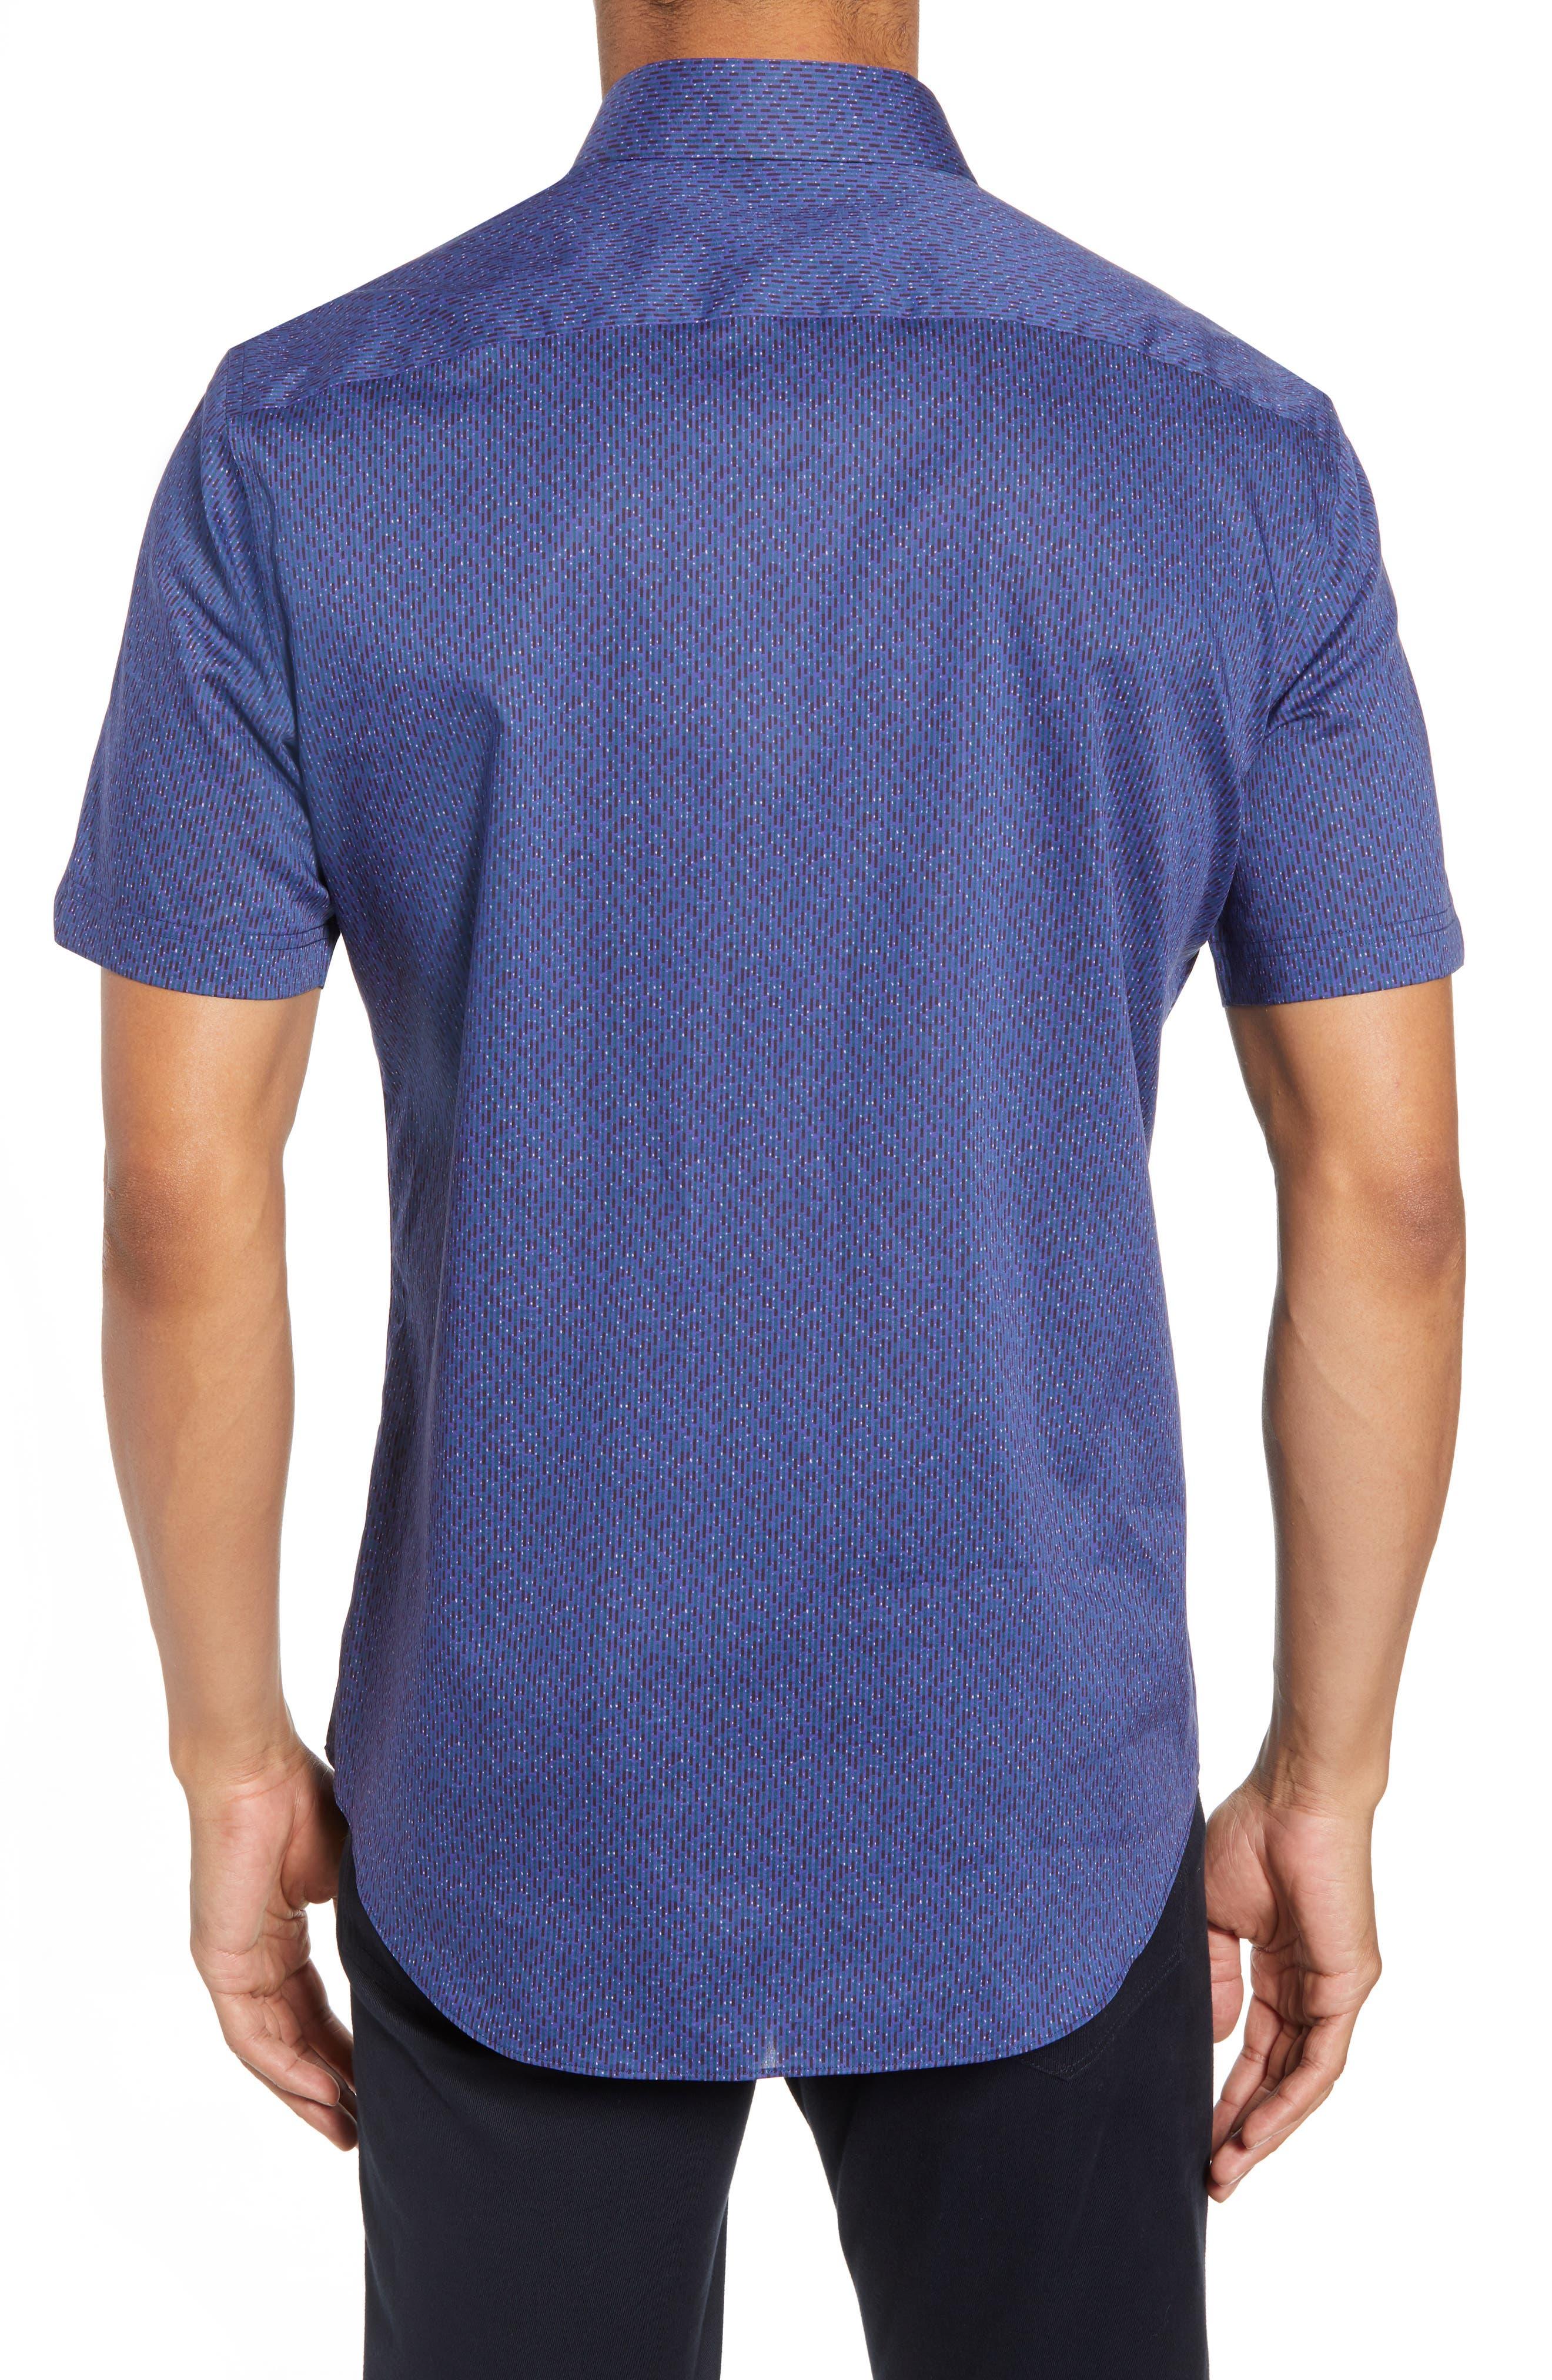 ZACHARY PRELL, Print Sport Shirt, Alternate thumbnail 2, color, 410